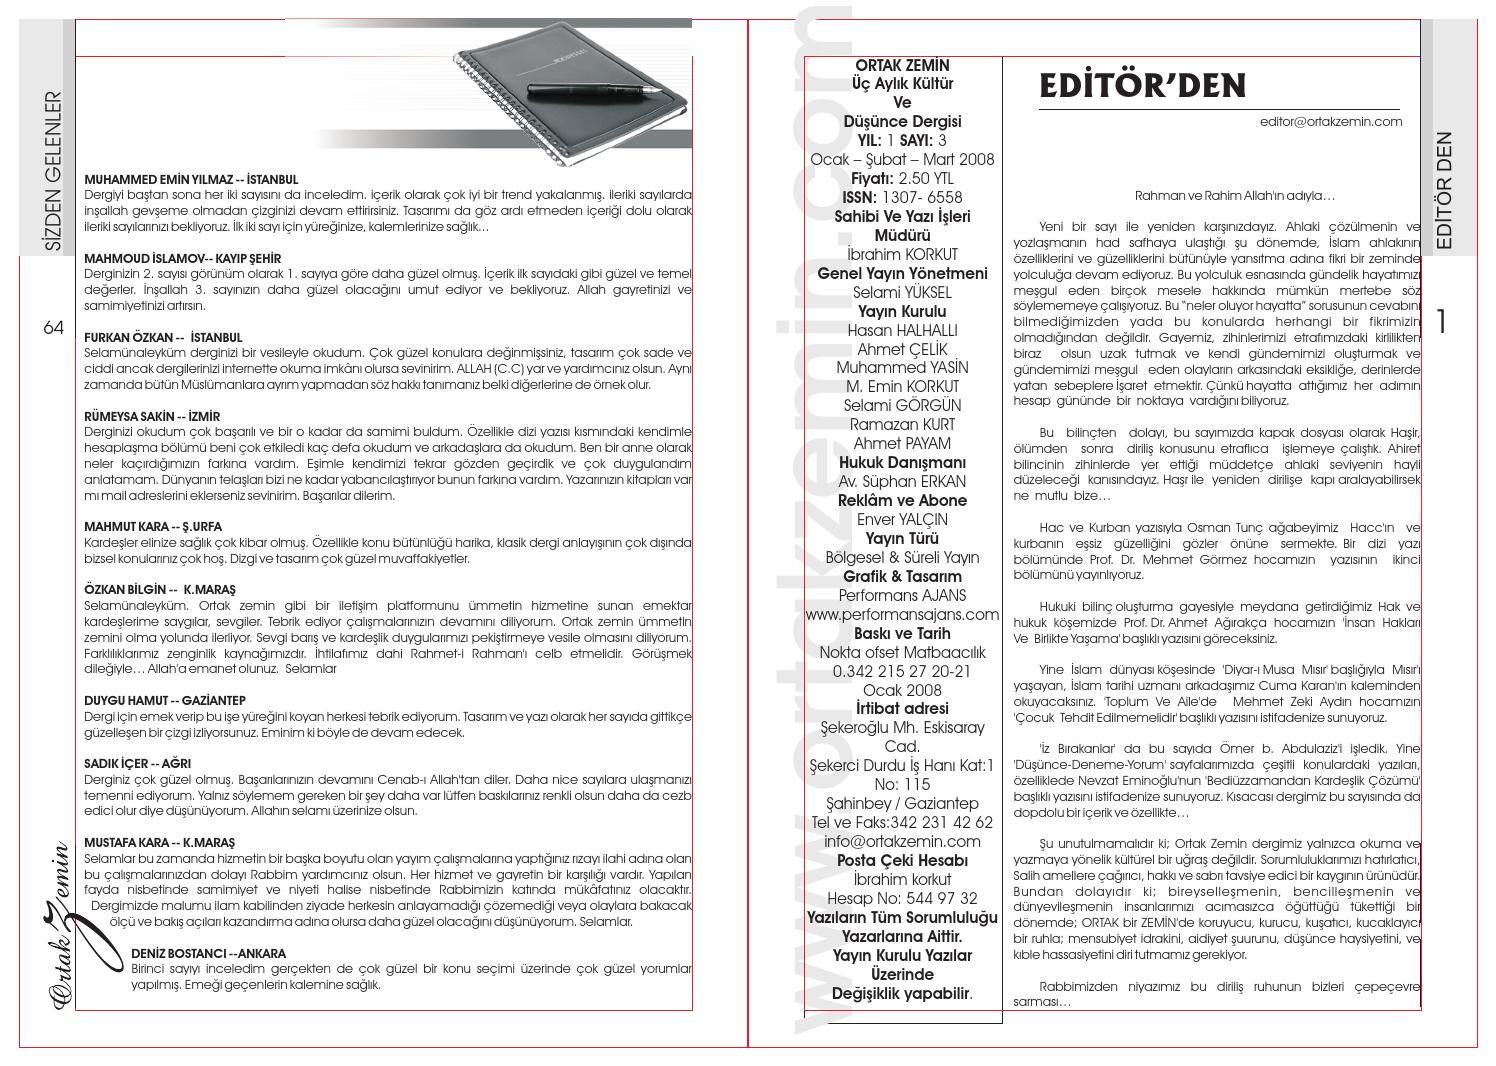 Ortak Zemin Dergisi Sayi 3 By Ahmet Celik Issuu